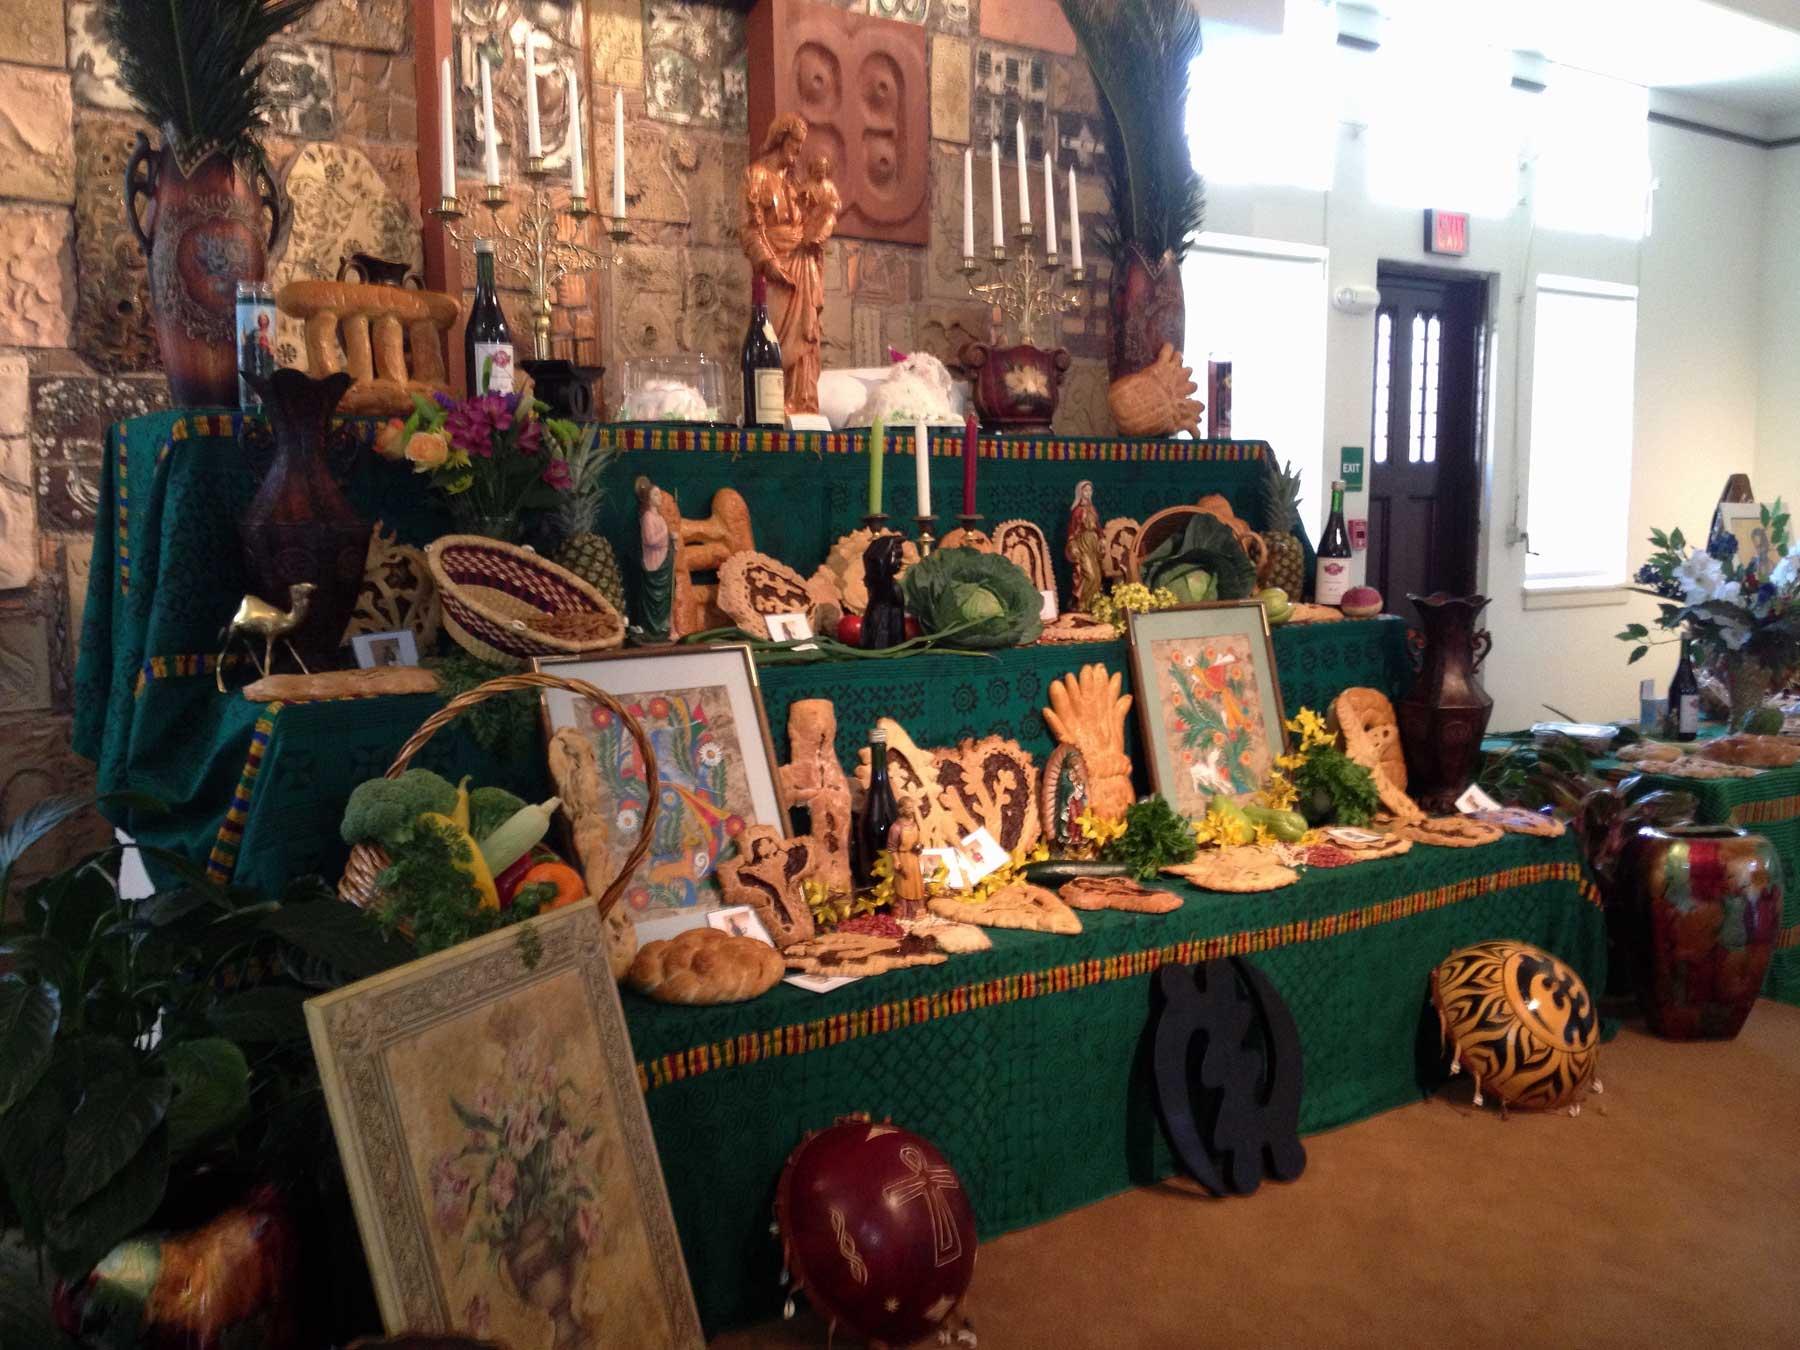 St Joseph's table showing decorative breads